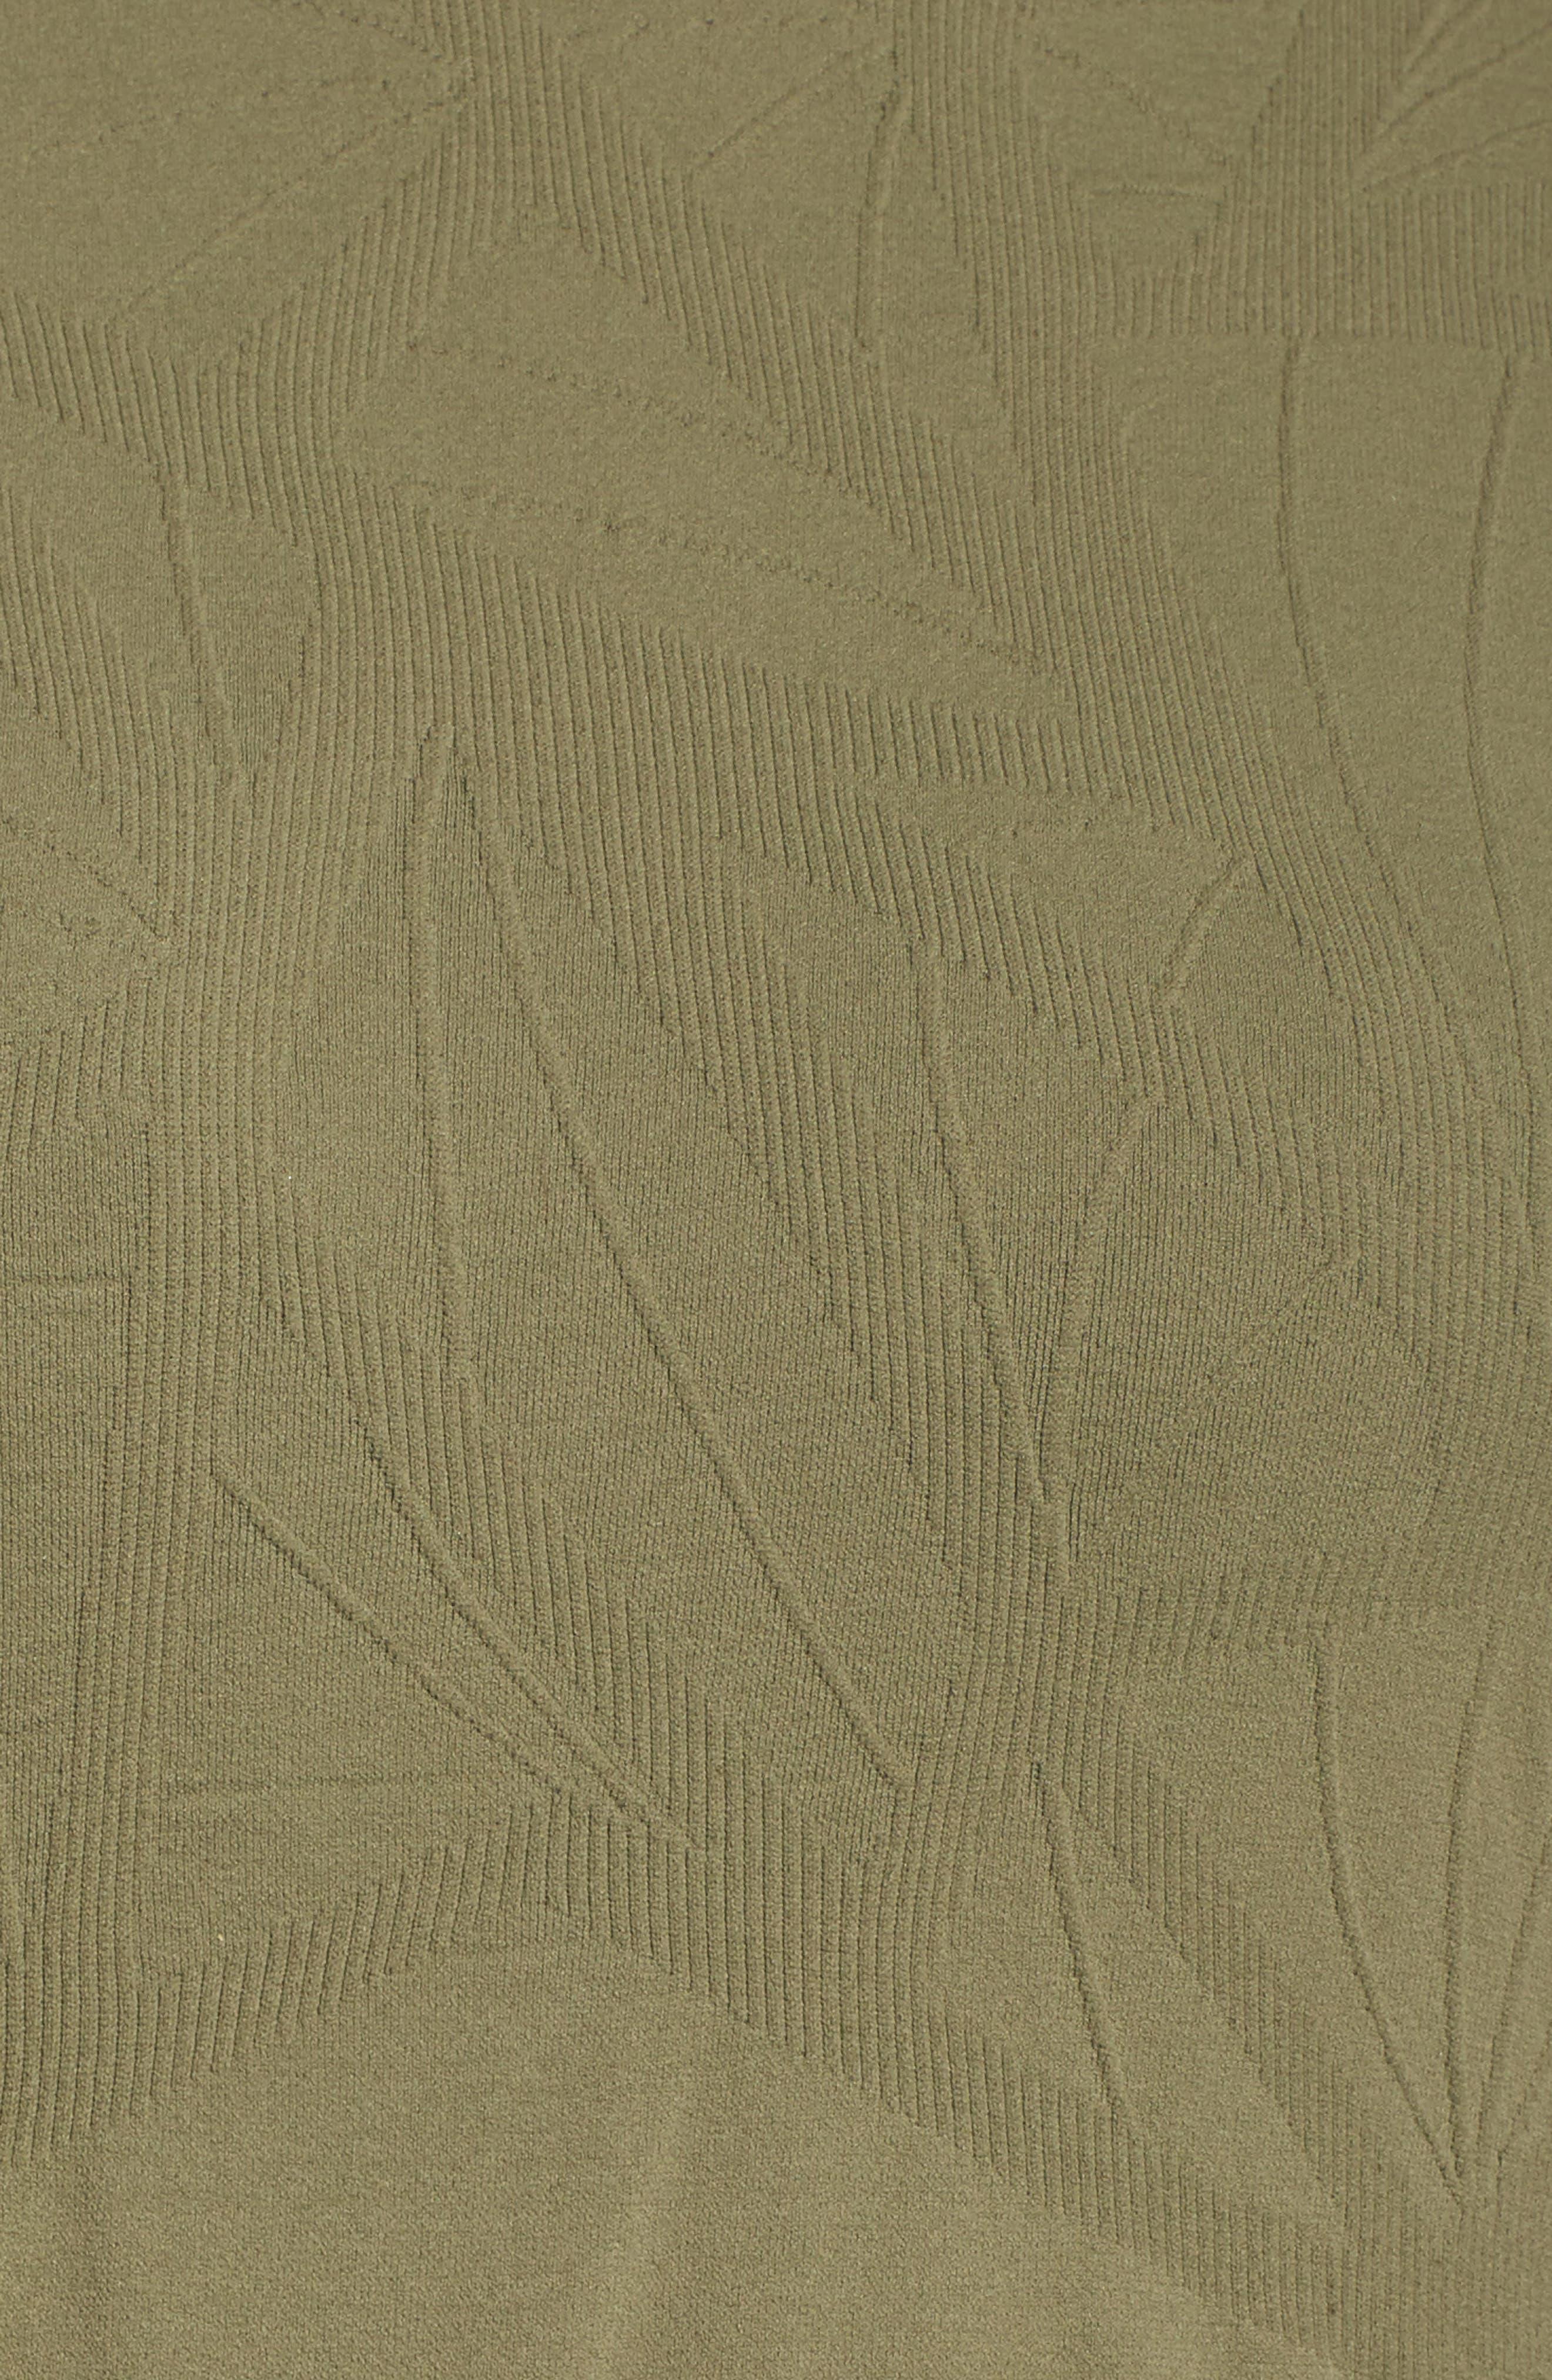 No Boundary Hoodie,                             Alternate thumbnail 6, color,                             Deep Lichen Green